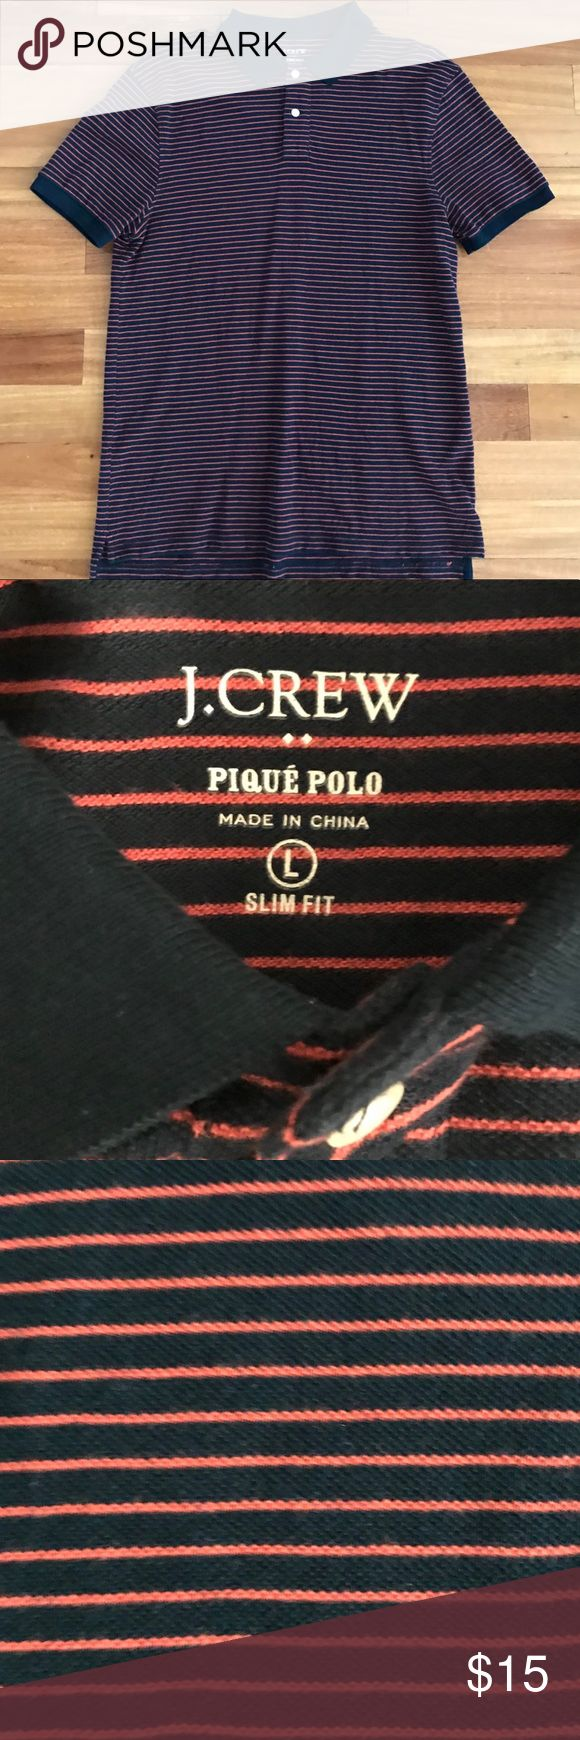 Men's J. Crew Pique Stripe Polo Shirt. Men's J. Crew Navy and Pink Stripe Pique Polo Shirt. Slim Fit Size Large. J. Crew Shirts Polos